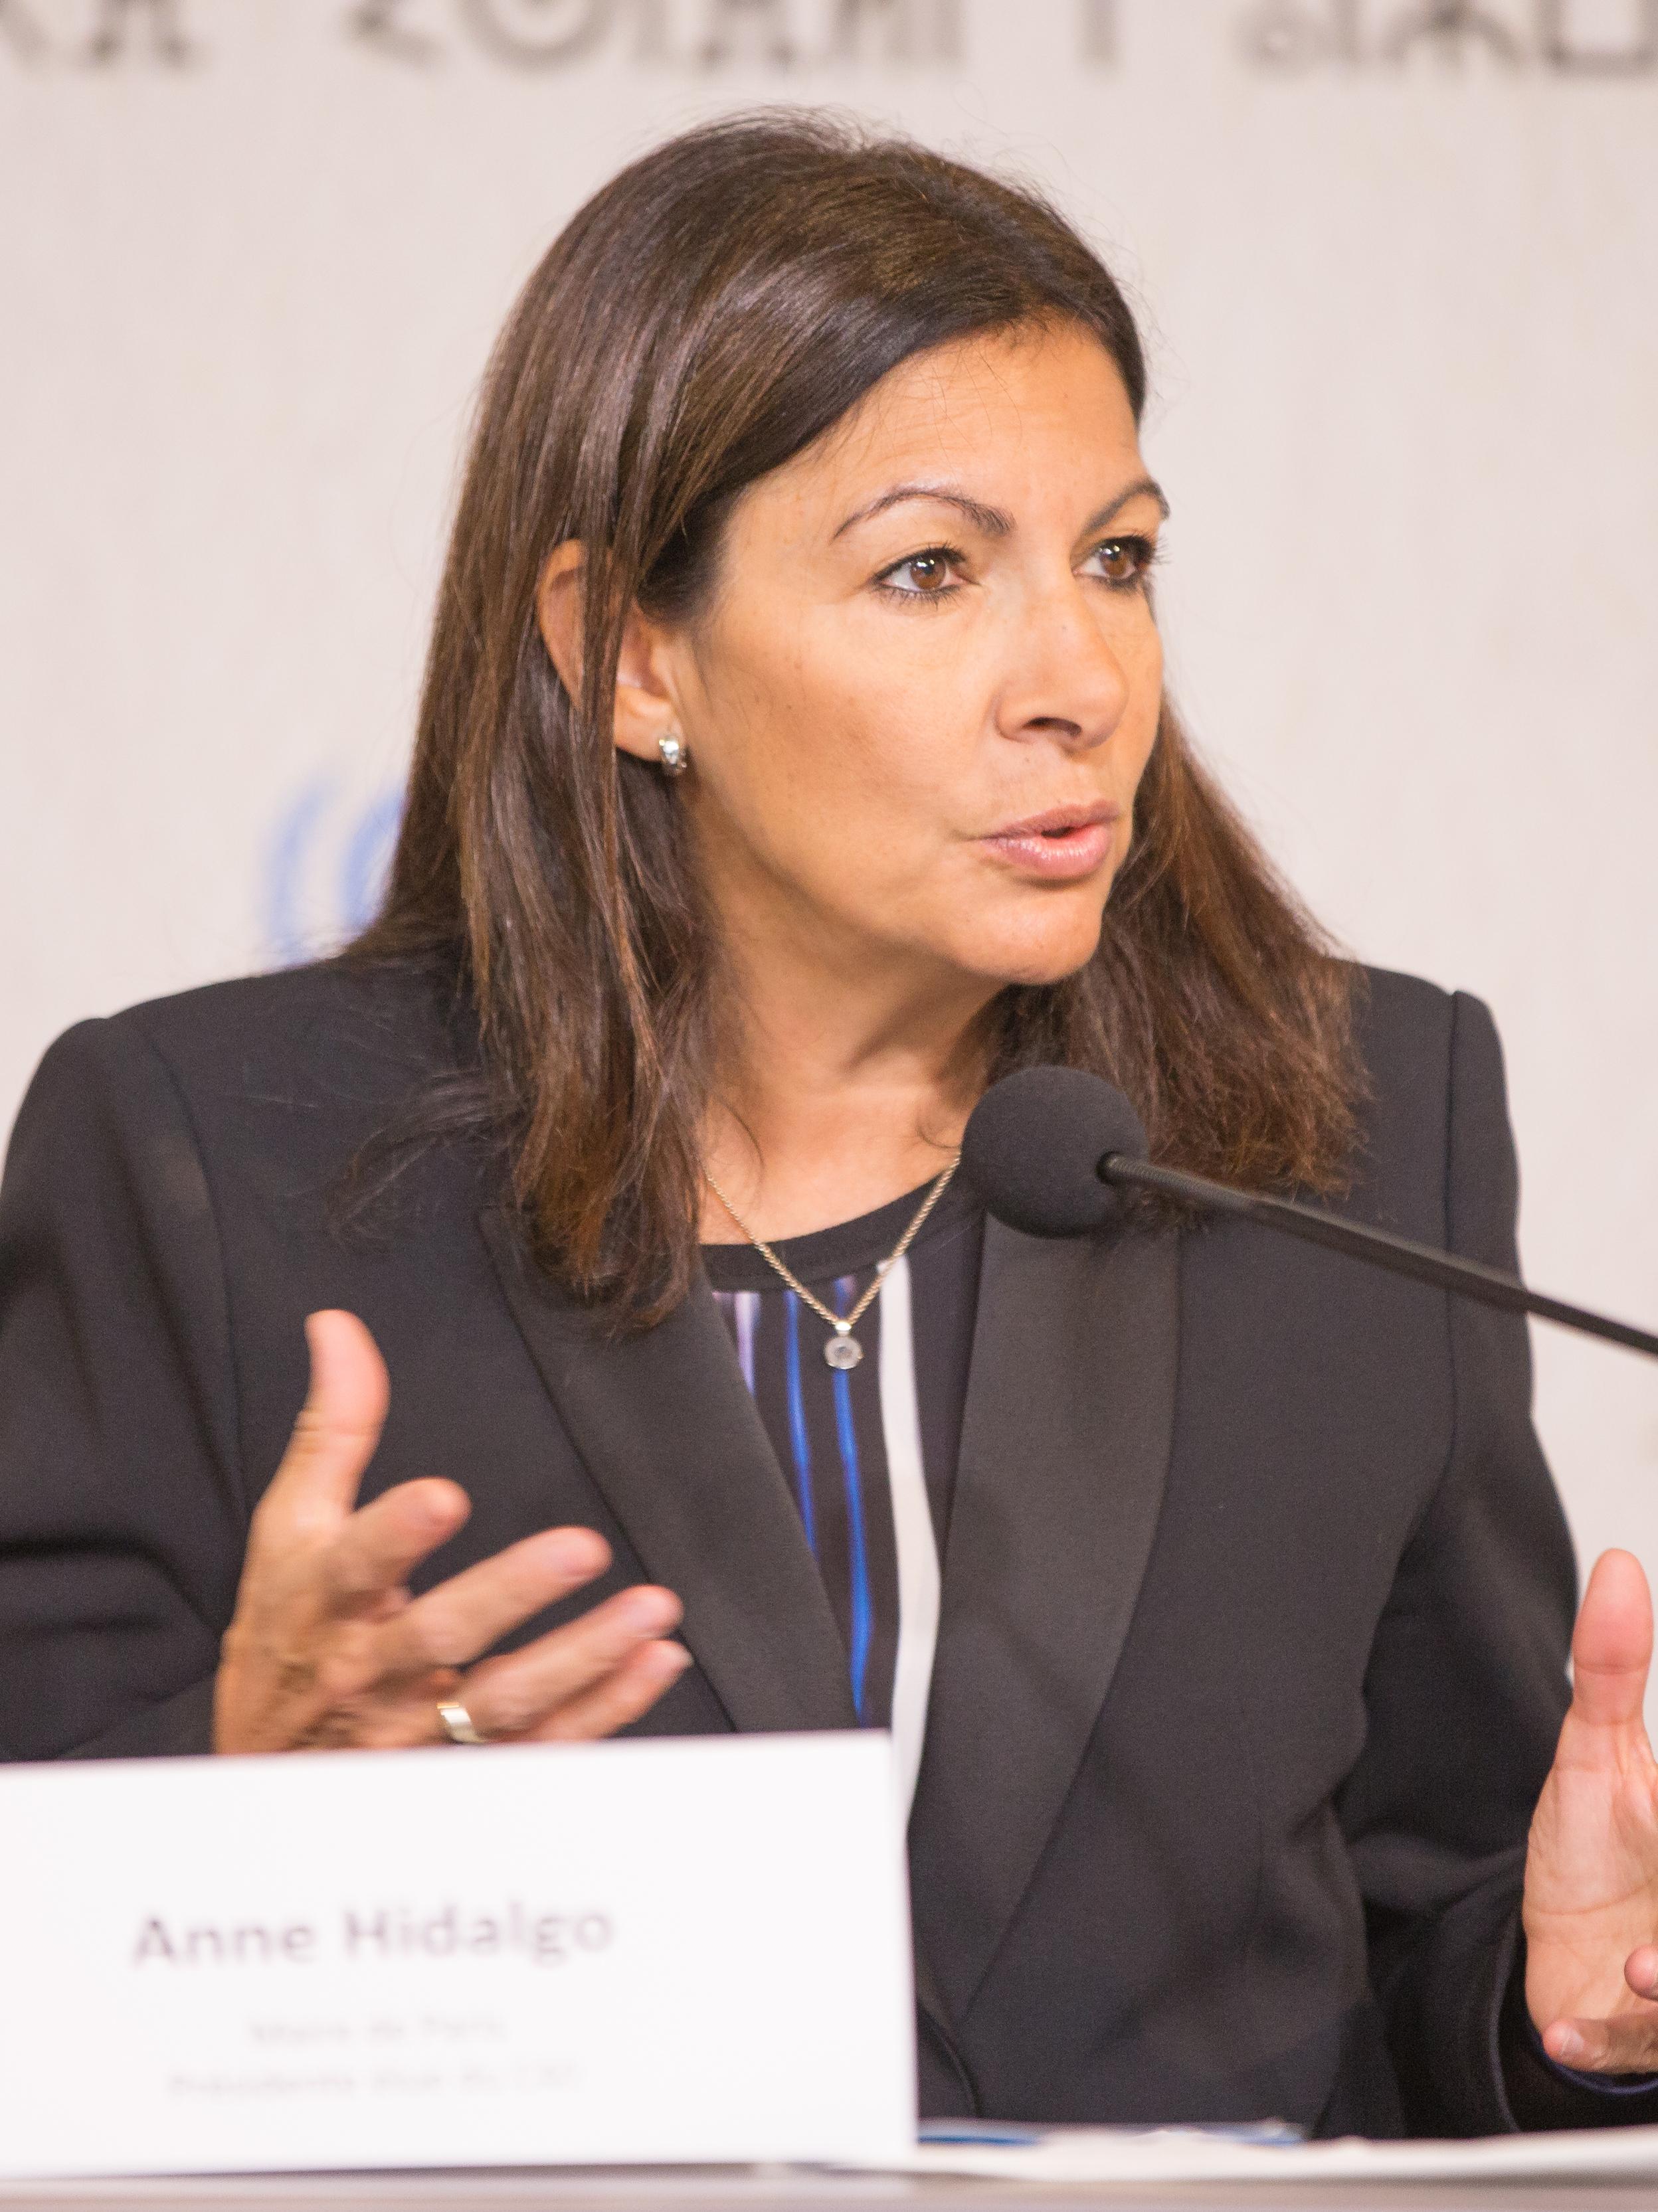 Anne Hidalgo - Wikipedia